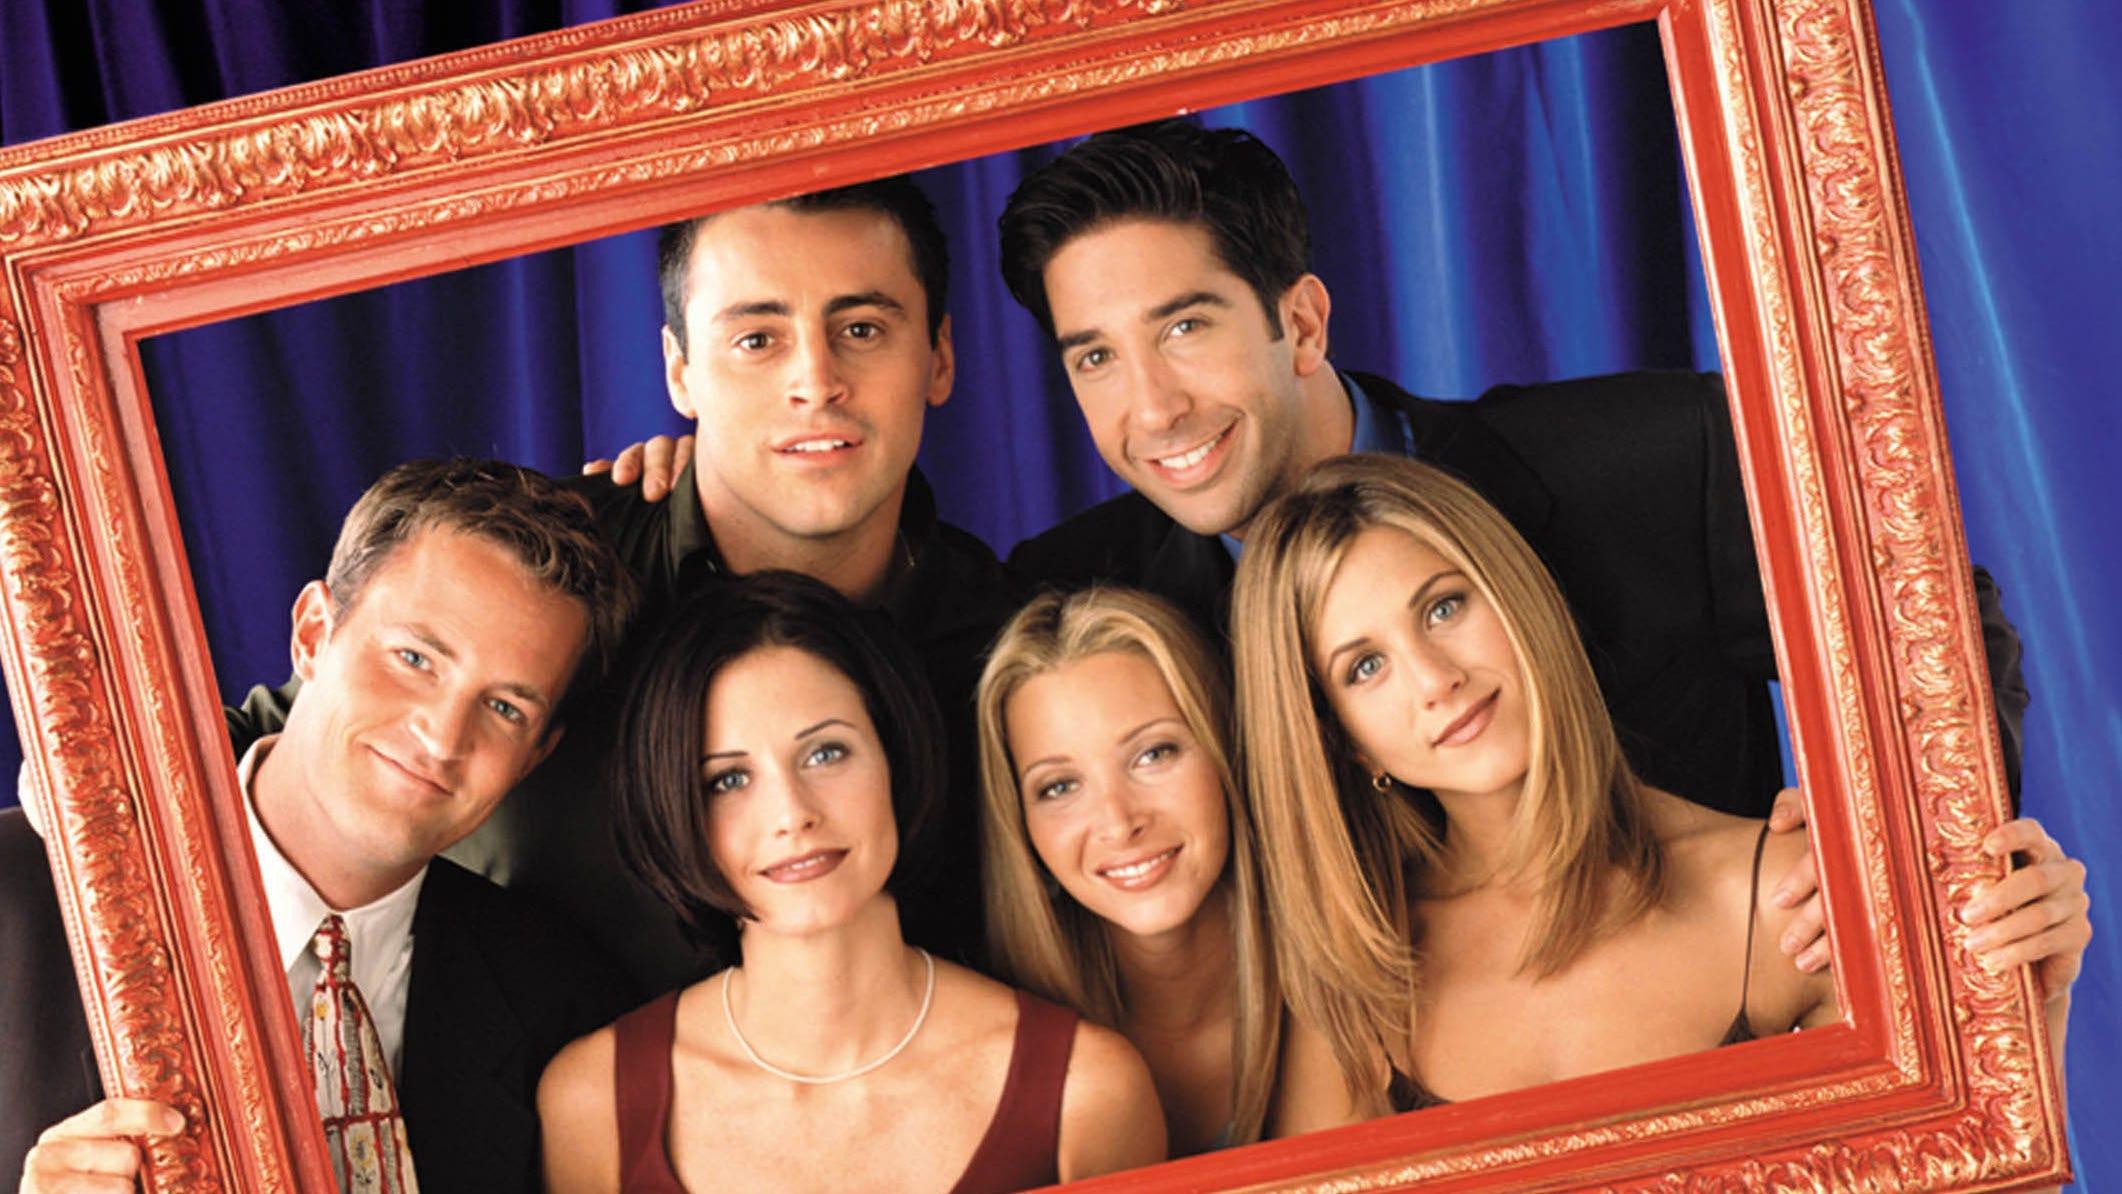 Ultimate friendship goals, Joey, Ross, Chandler, Monica, Phoebe and Rachel (Friends).